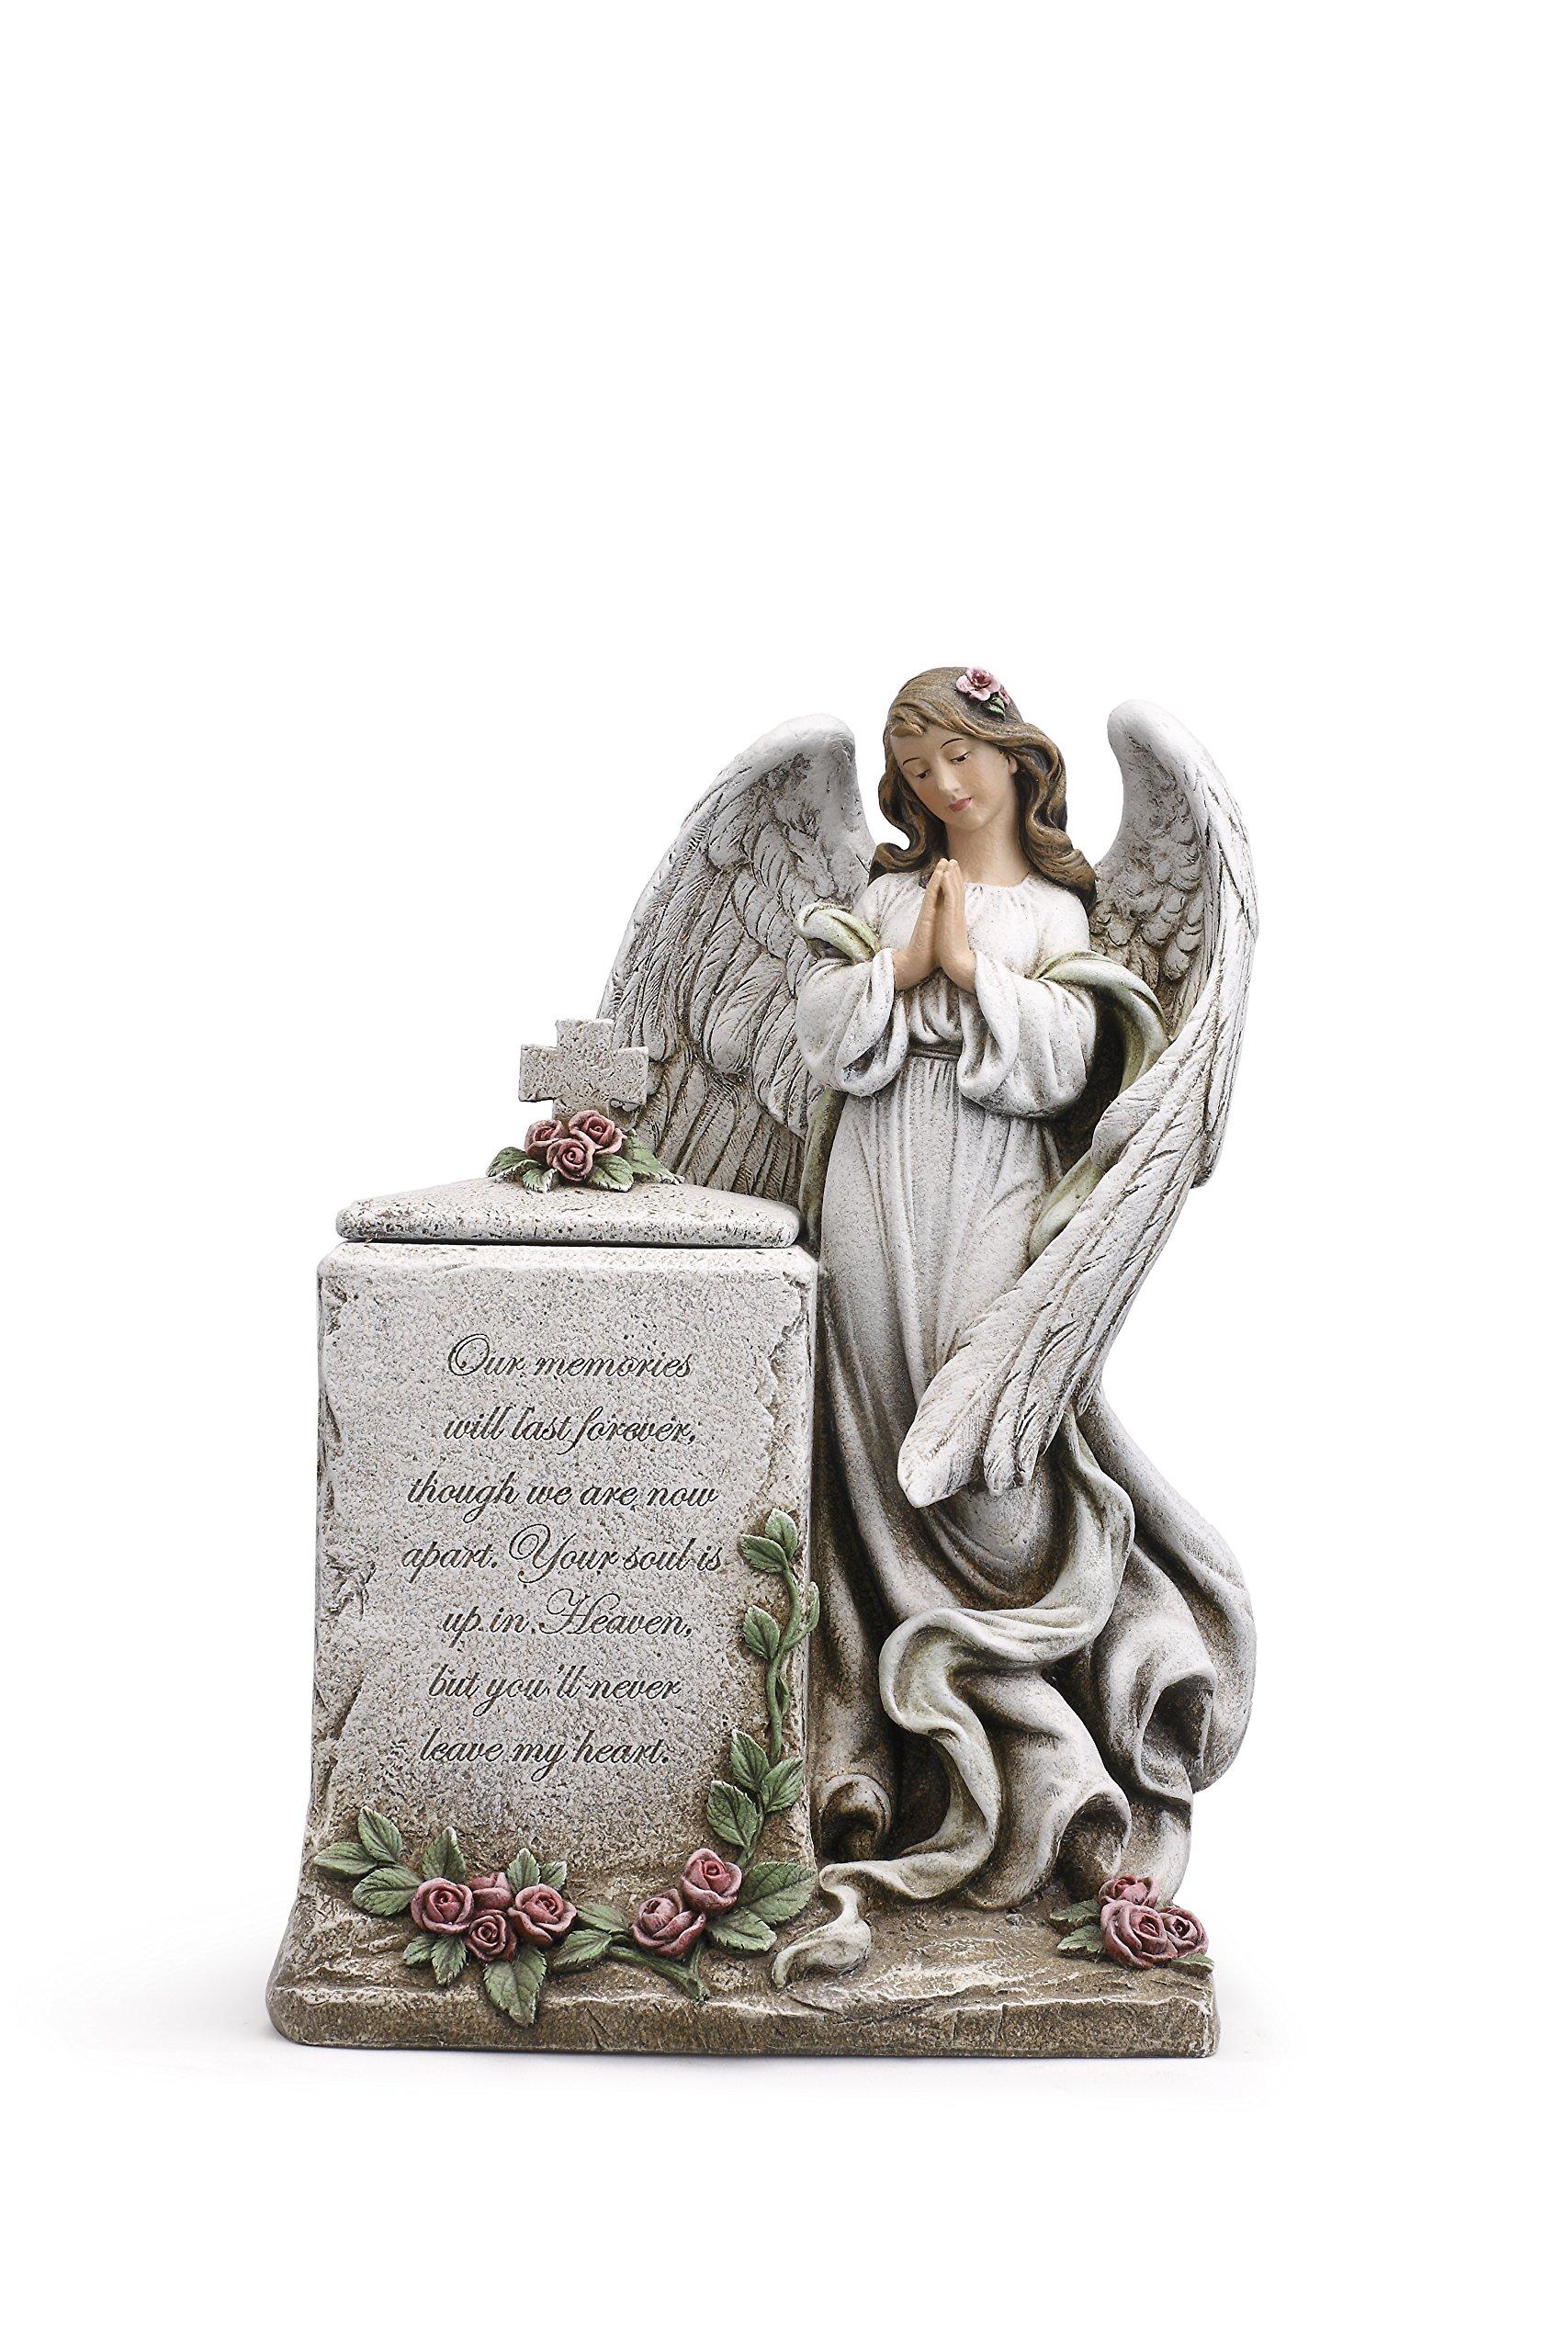 Praying Angel Inspirational 8 x 12 Inch Resin Decorative Bereavement Urn Box